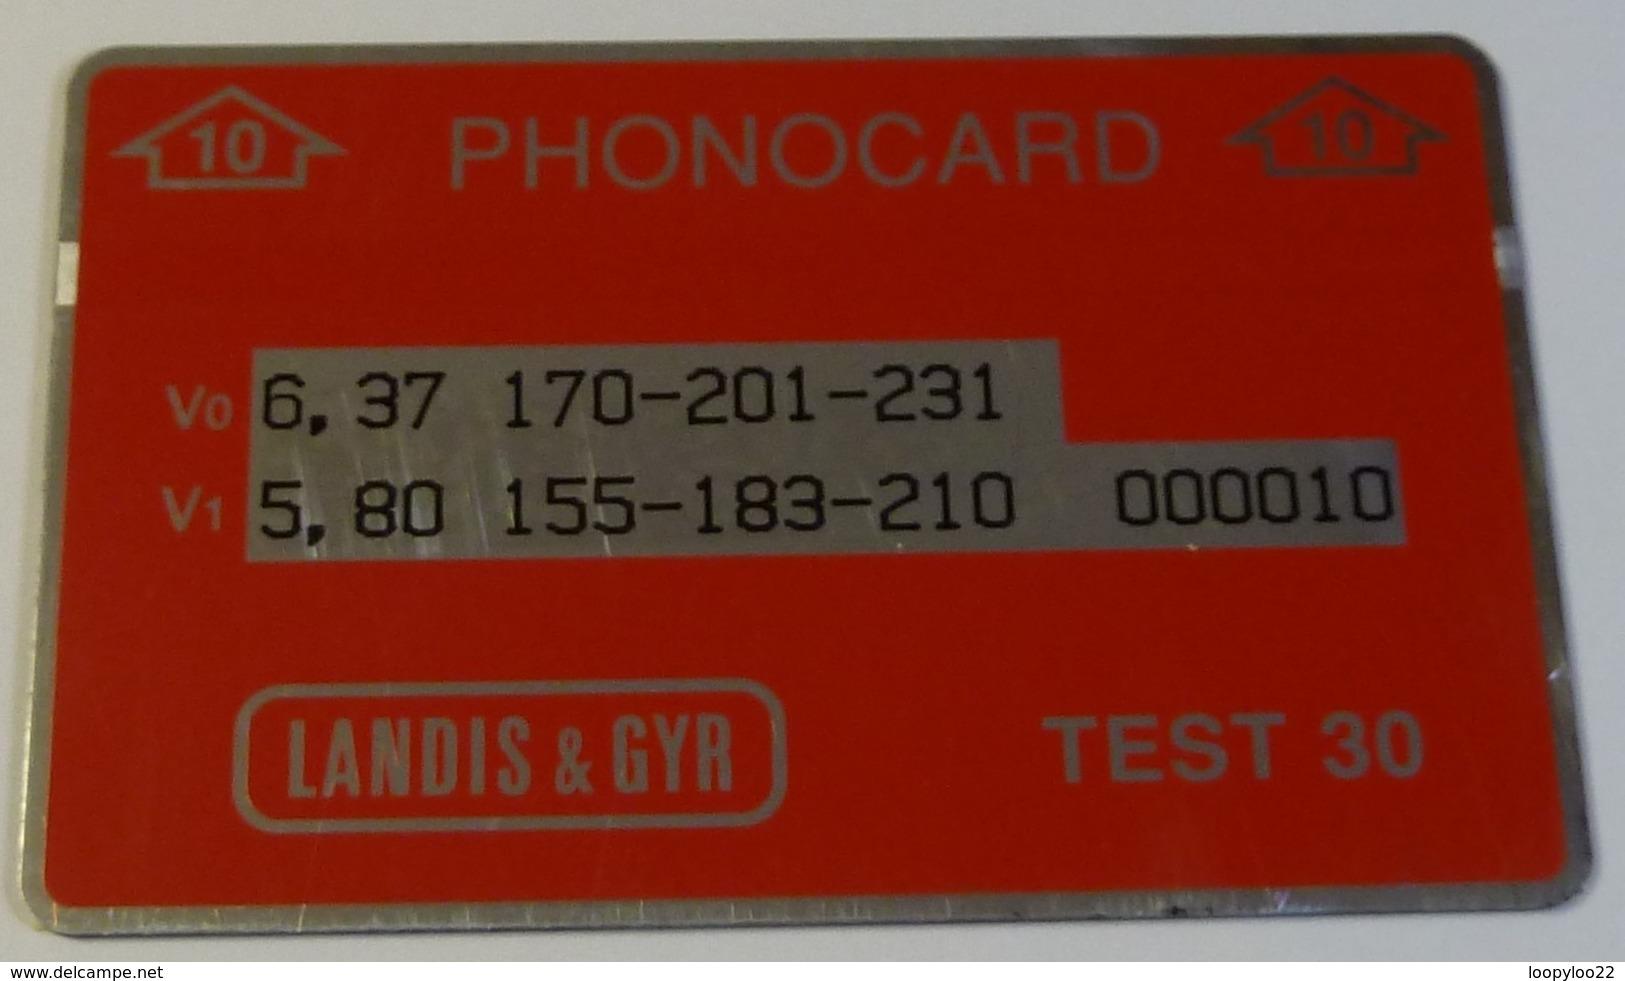 MOROCCO - L&G - Landis & Gyr - ENGINEER TEST - 10ex - RRR - Marruecos